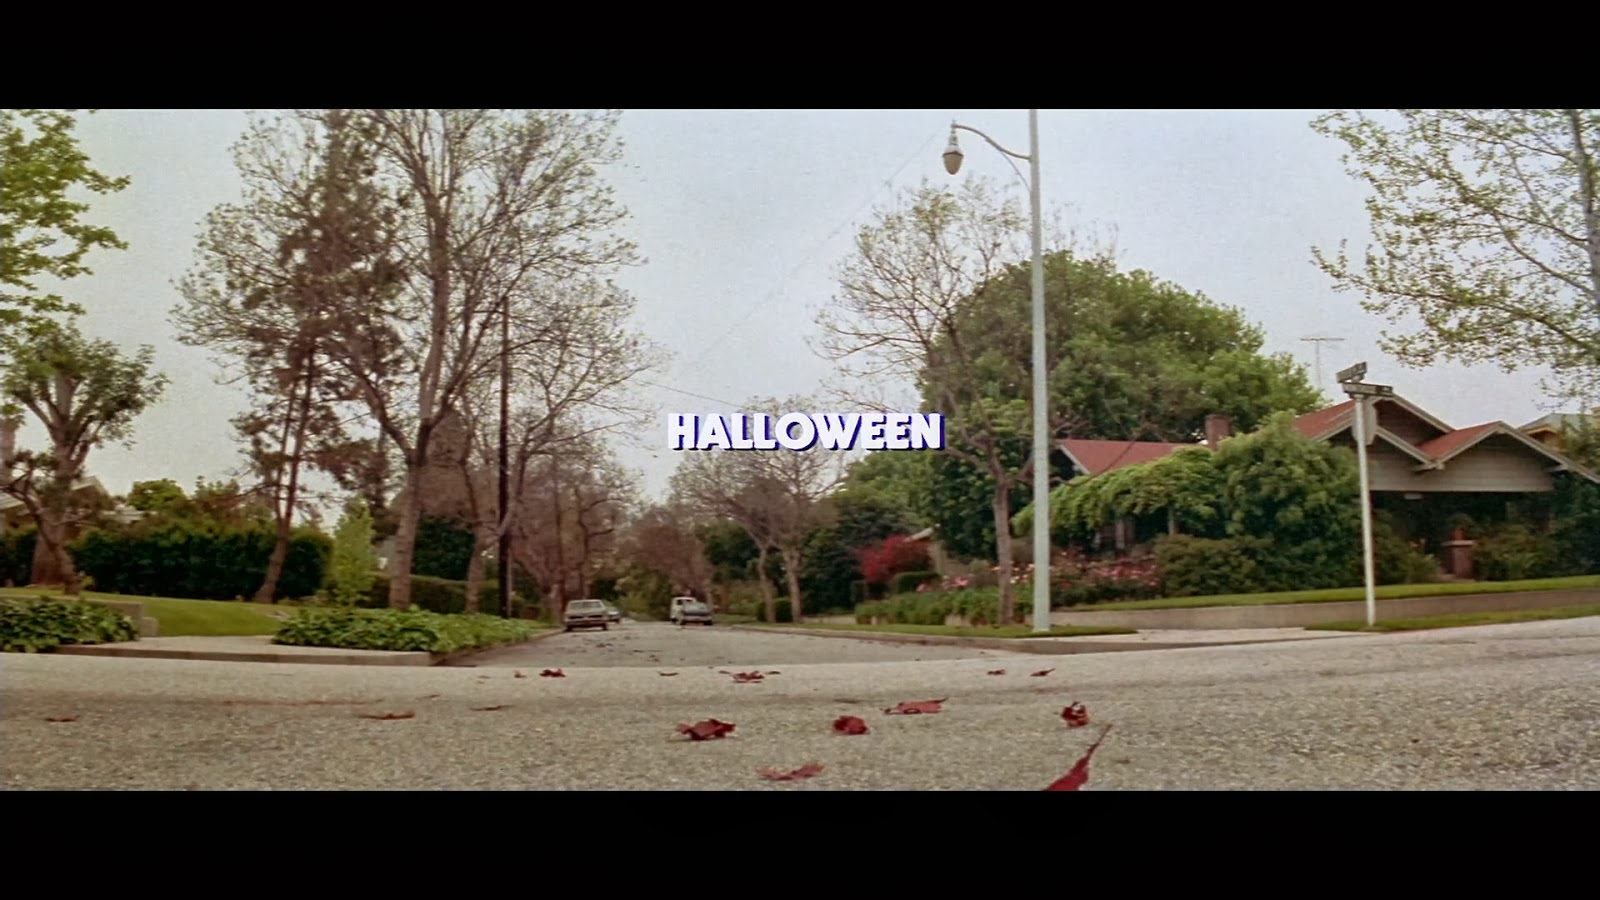 Halloween-028.jpg&f=1&nofb=1